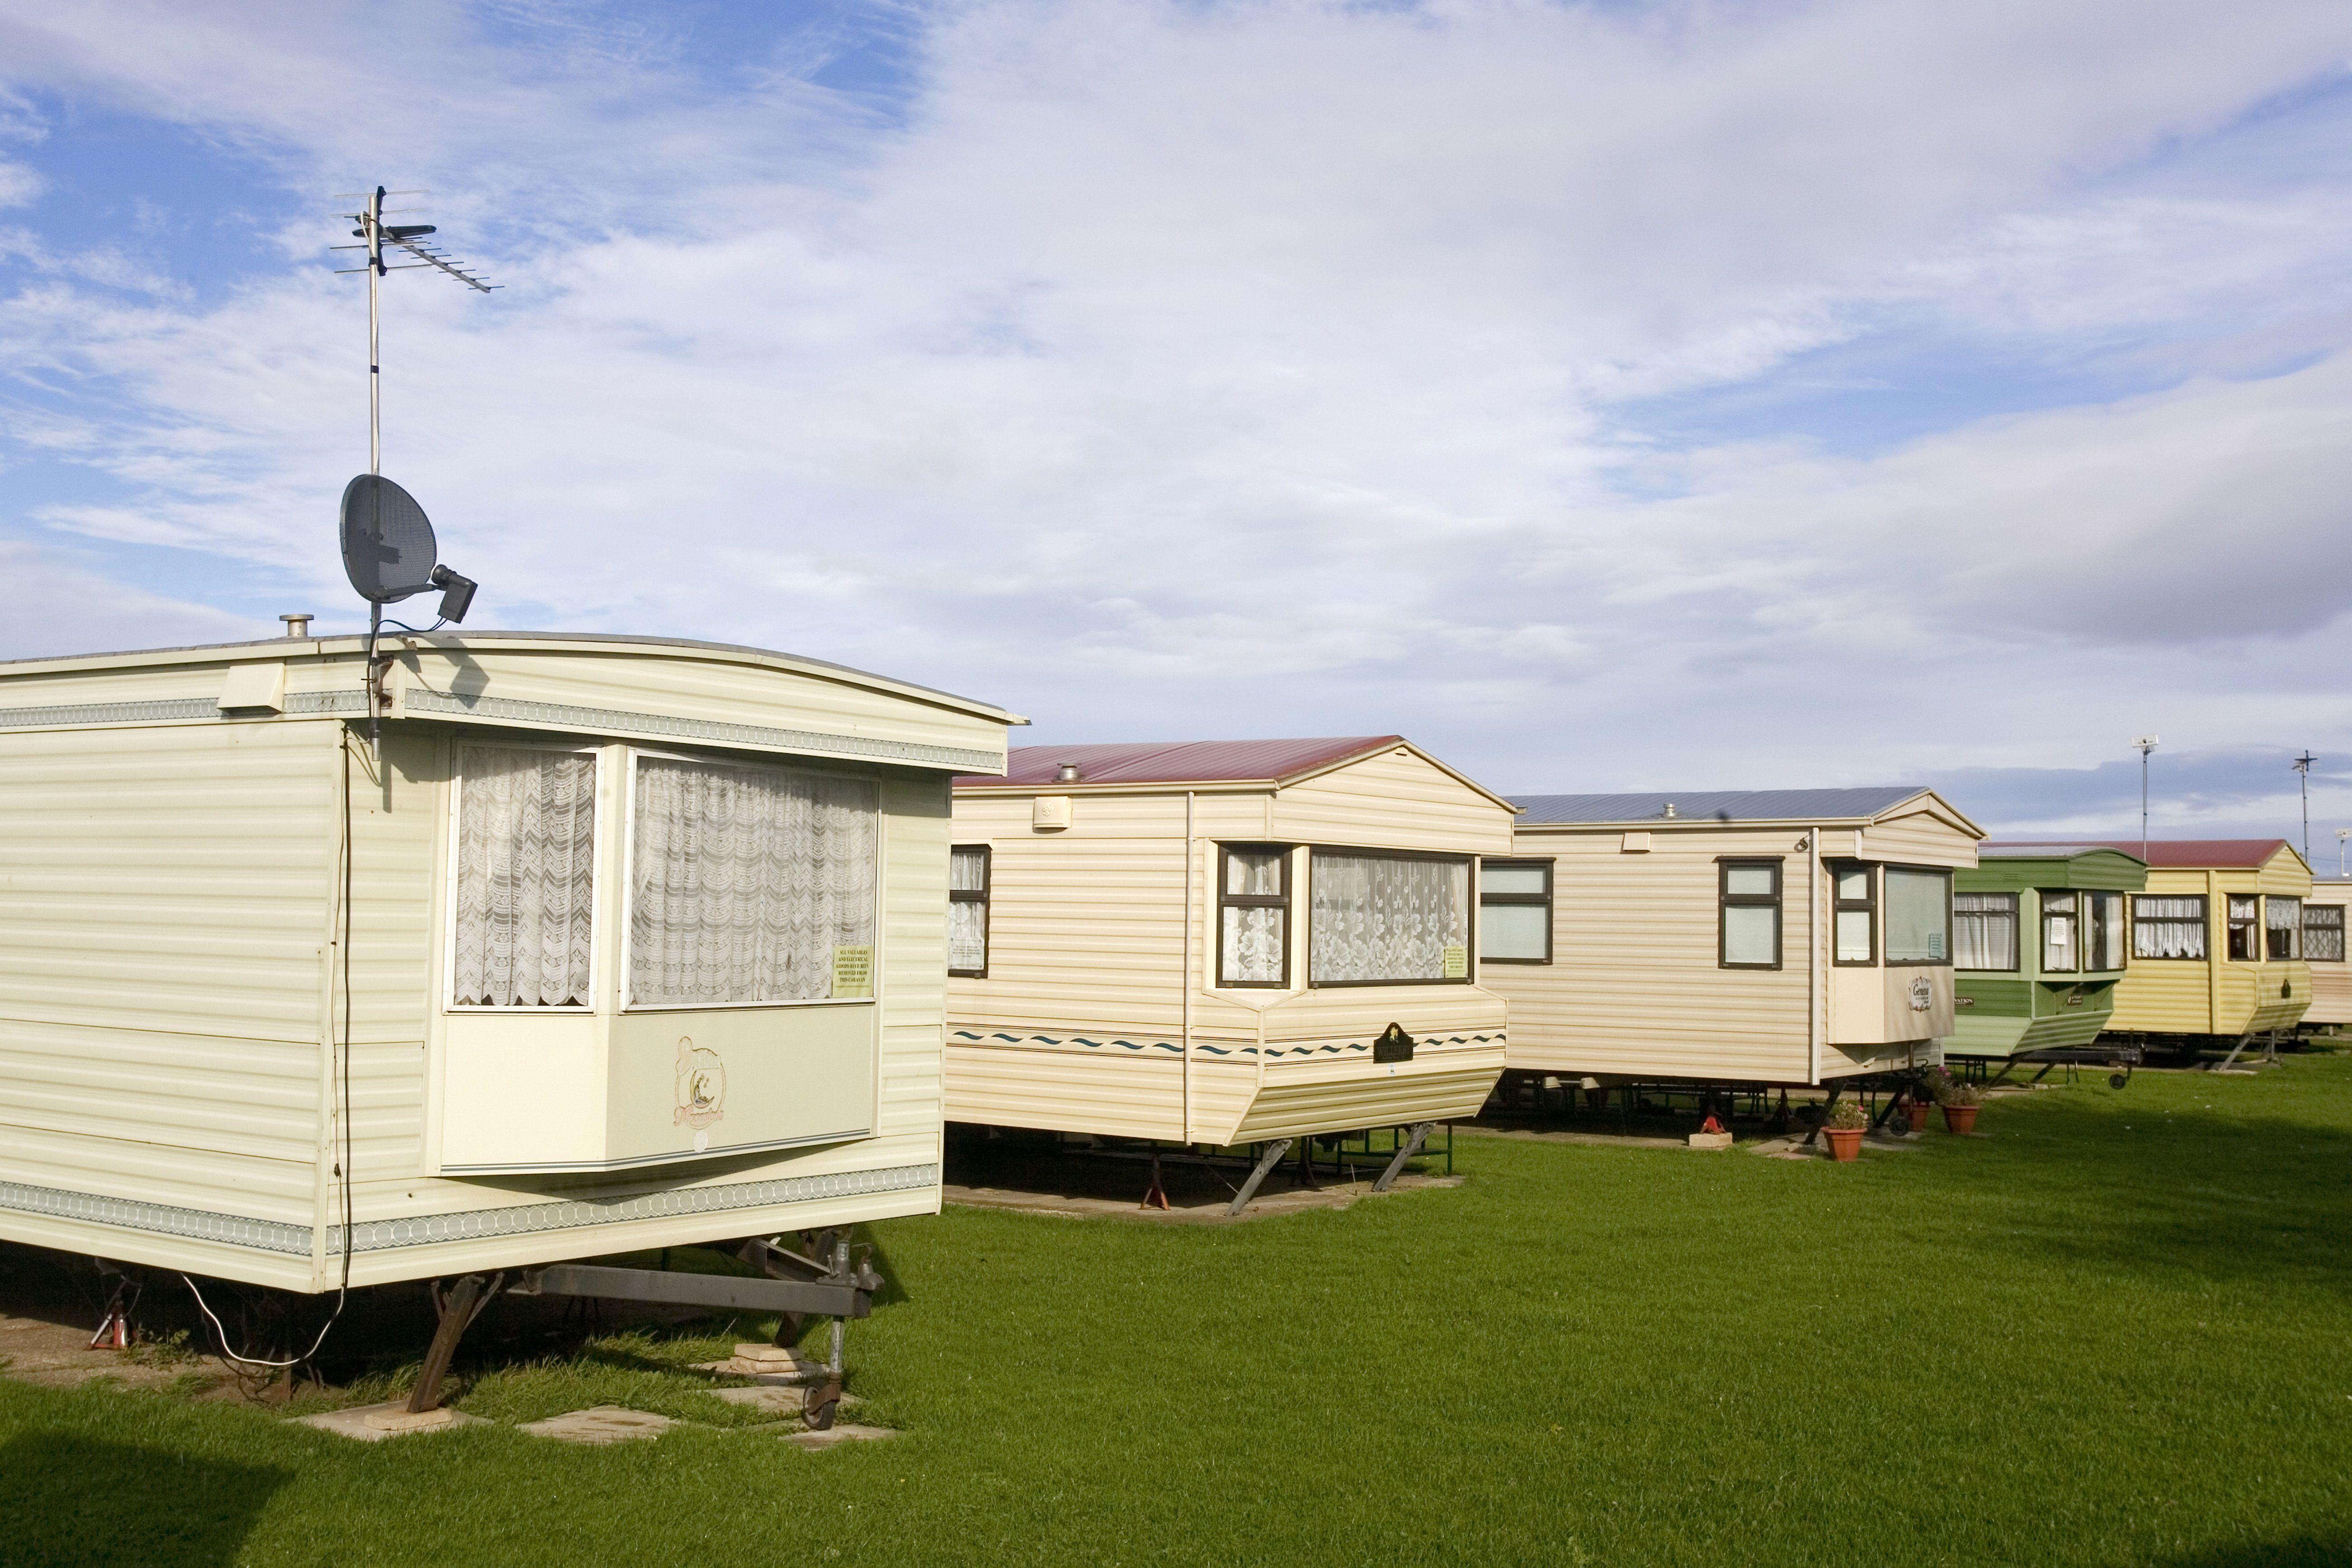 Flat Roof Repair For Mobile Homes